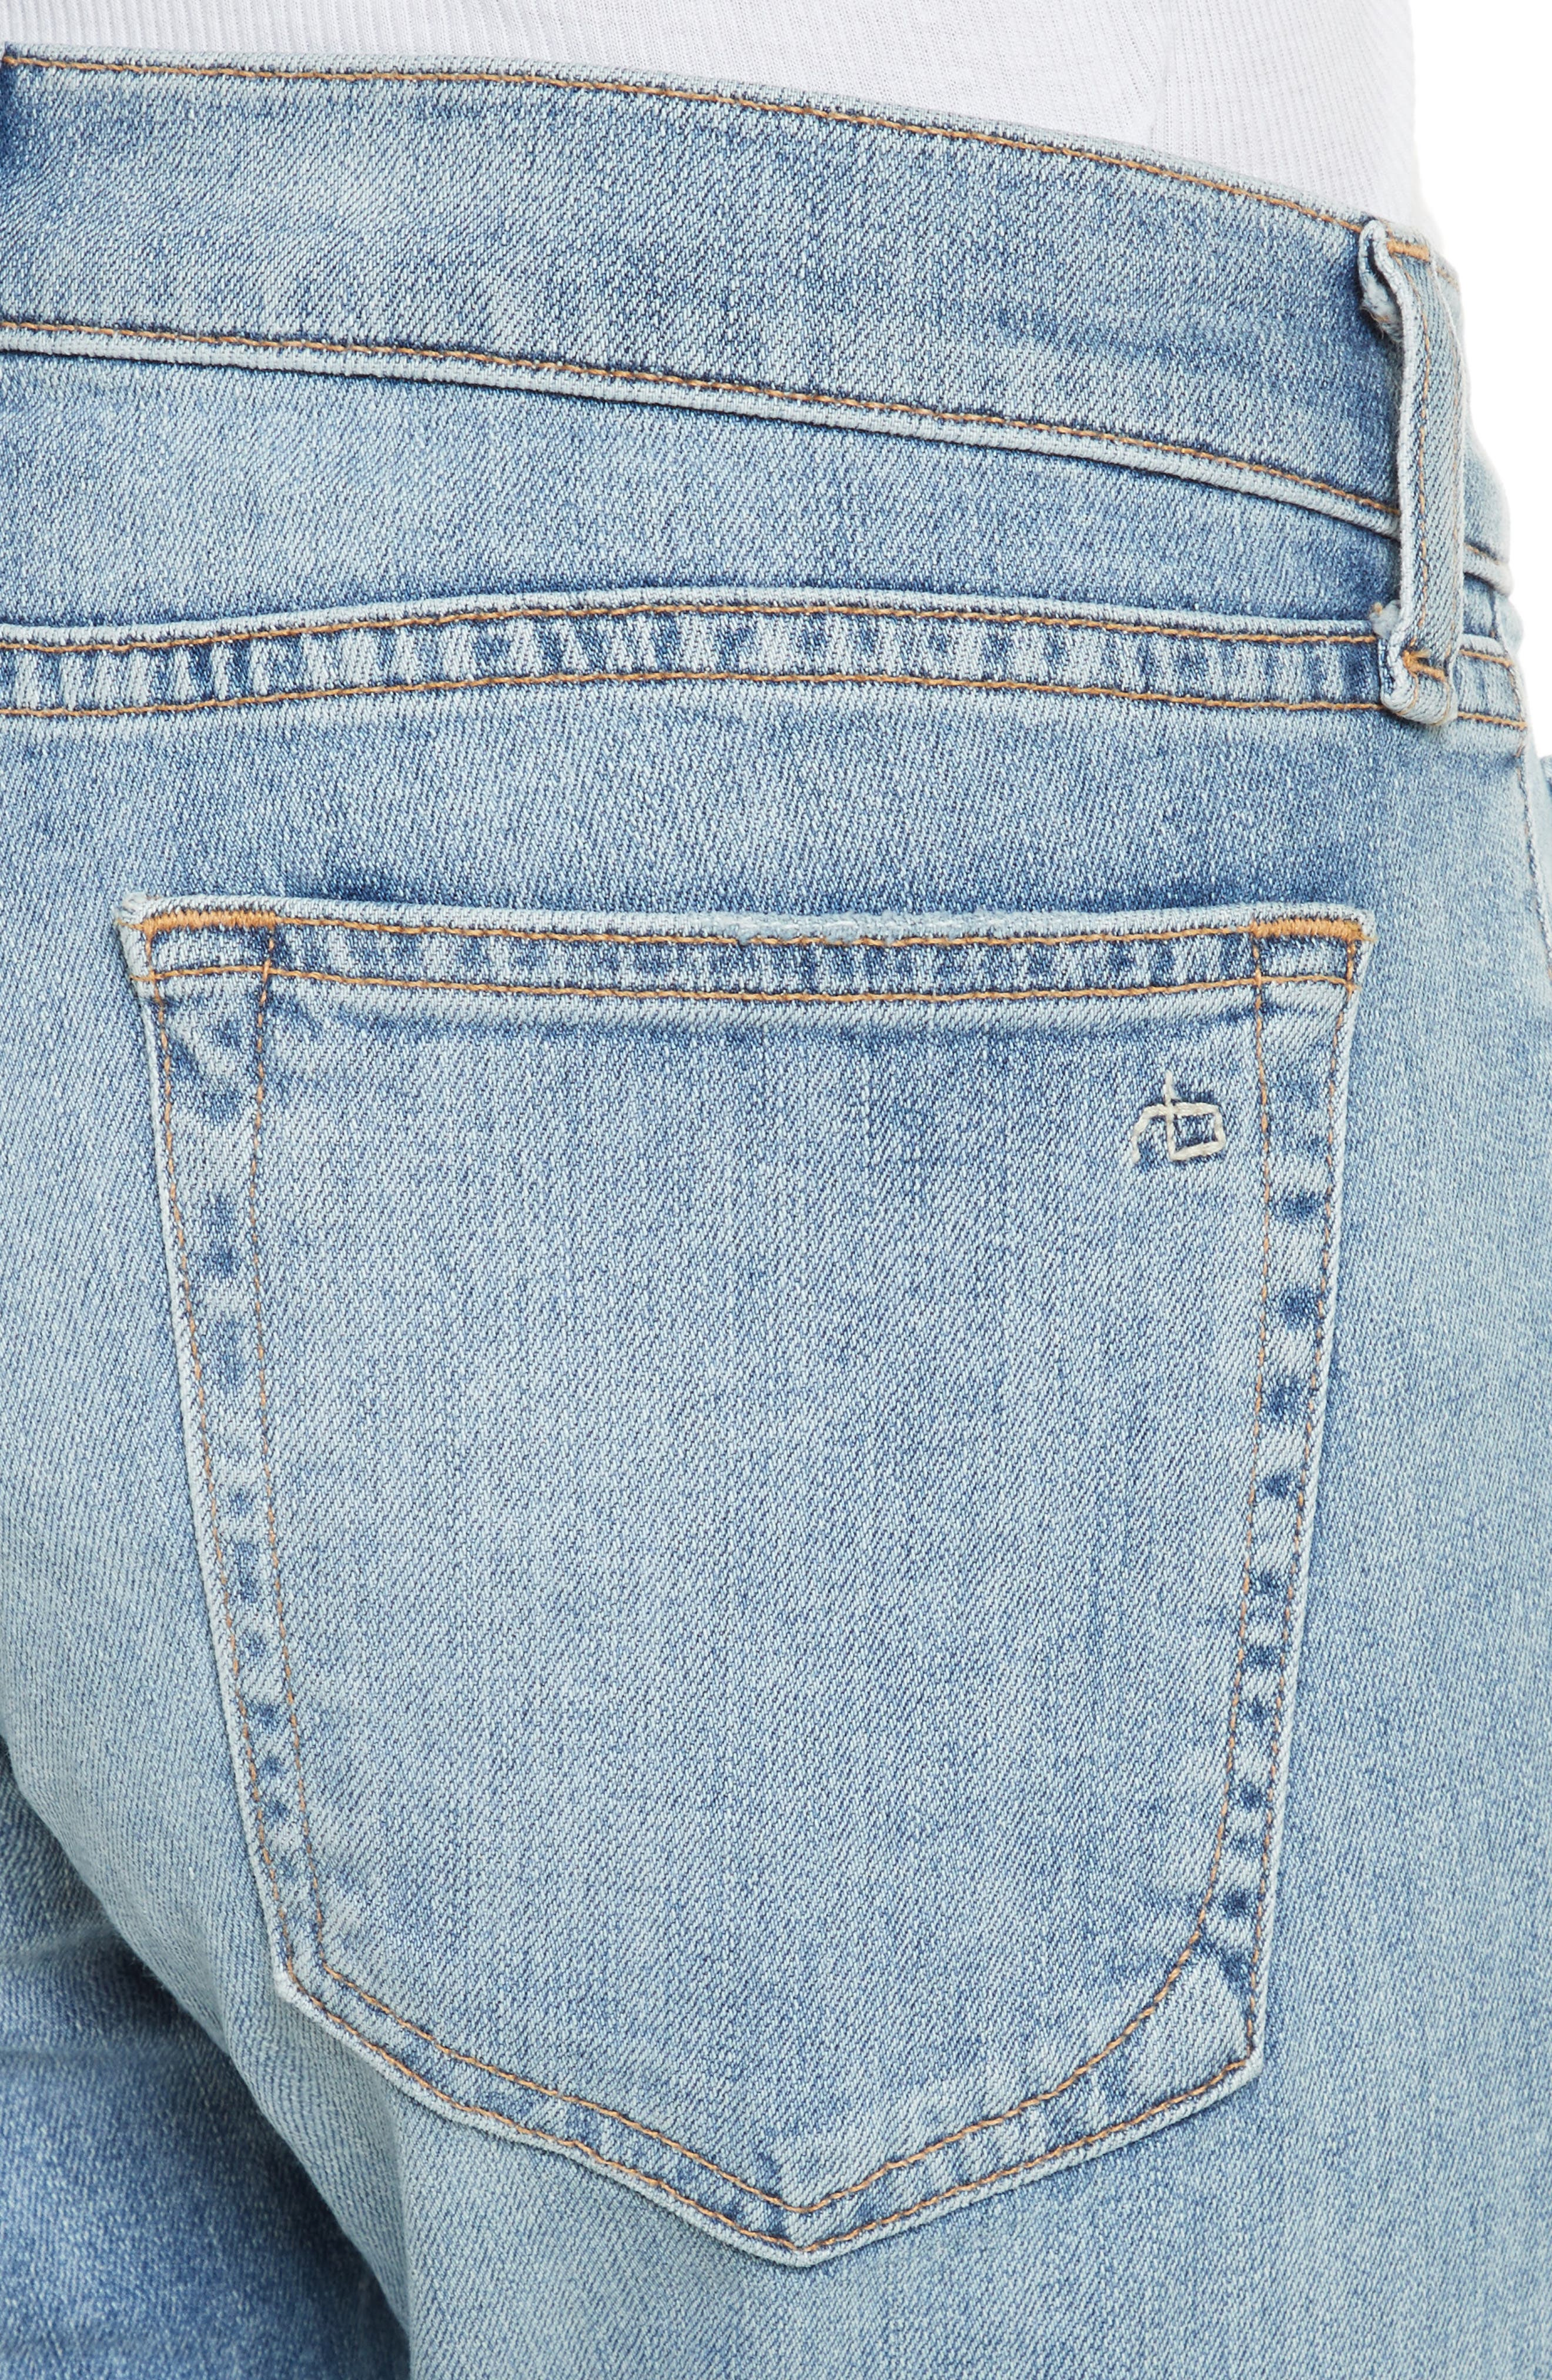 Alternate Image 4  - rag & bone/JEAN The Dre Slim Boyfriend Jeans (June)